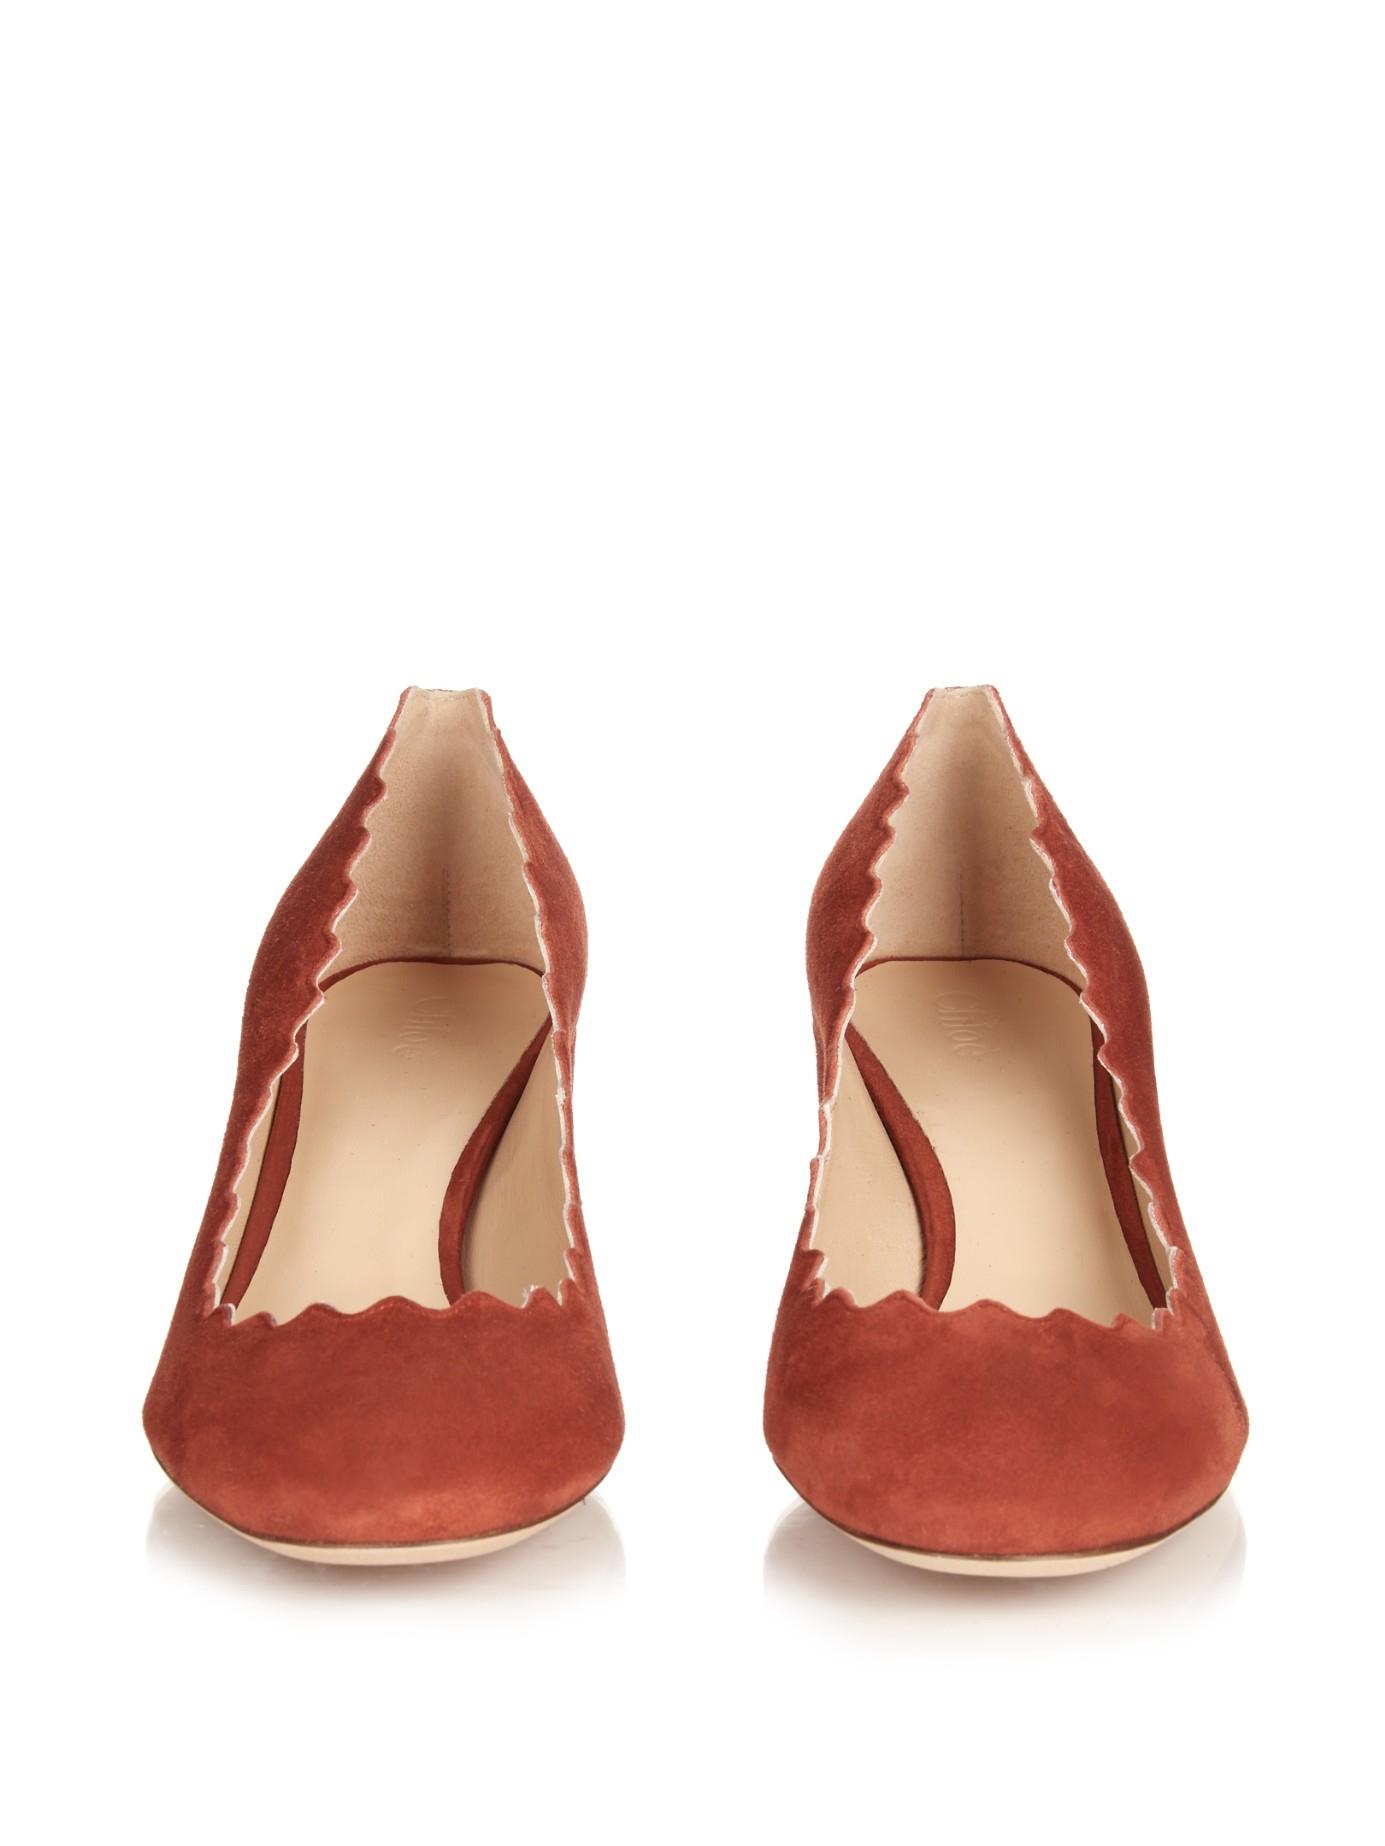 333cdf97e91 Lyst - Chloé Lauren Scallop-edged Block-heel Suede Pumps in Red